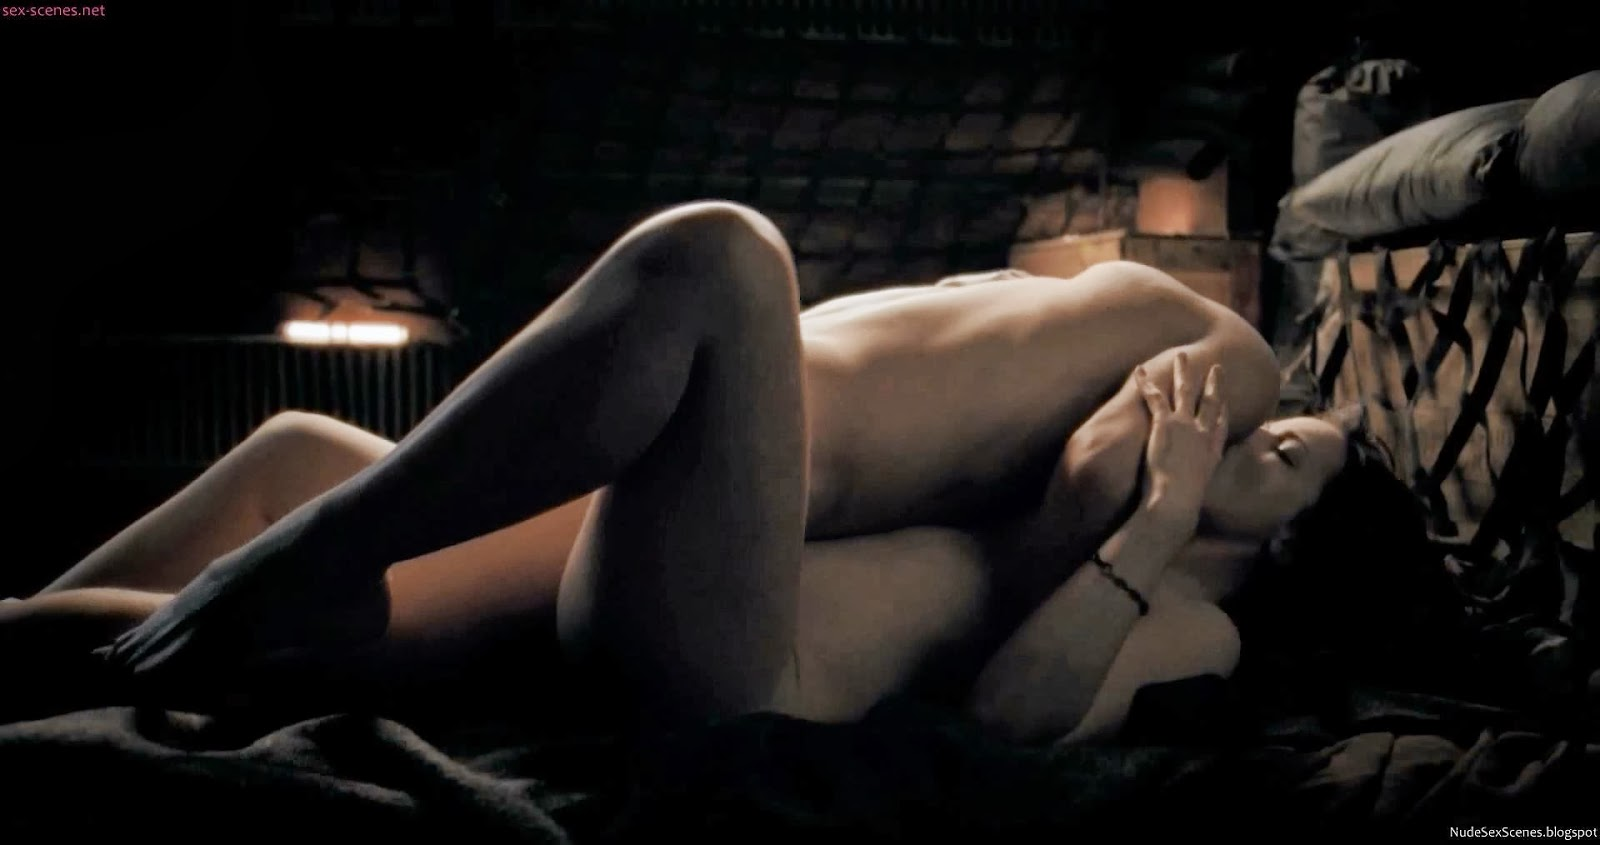 Kate beckinsale sex scene underworld